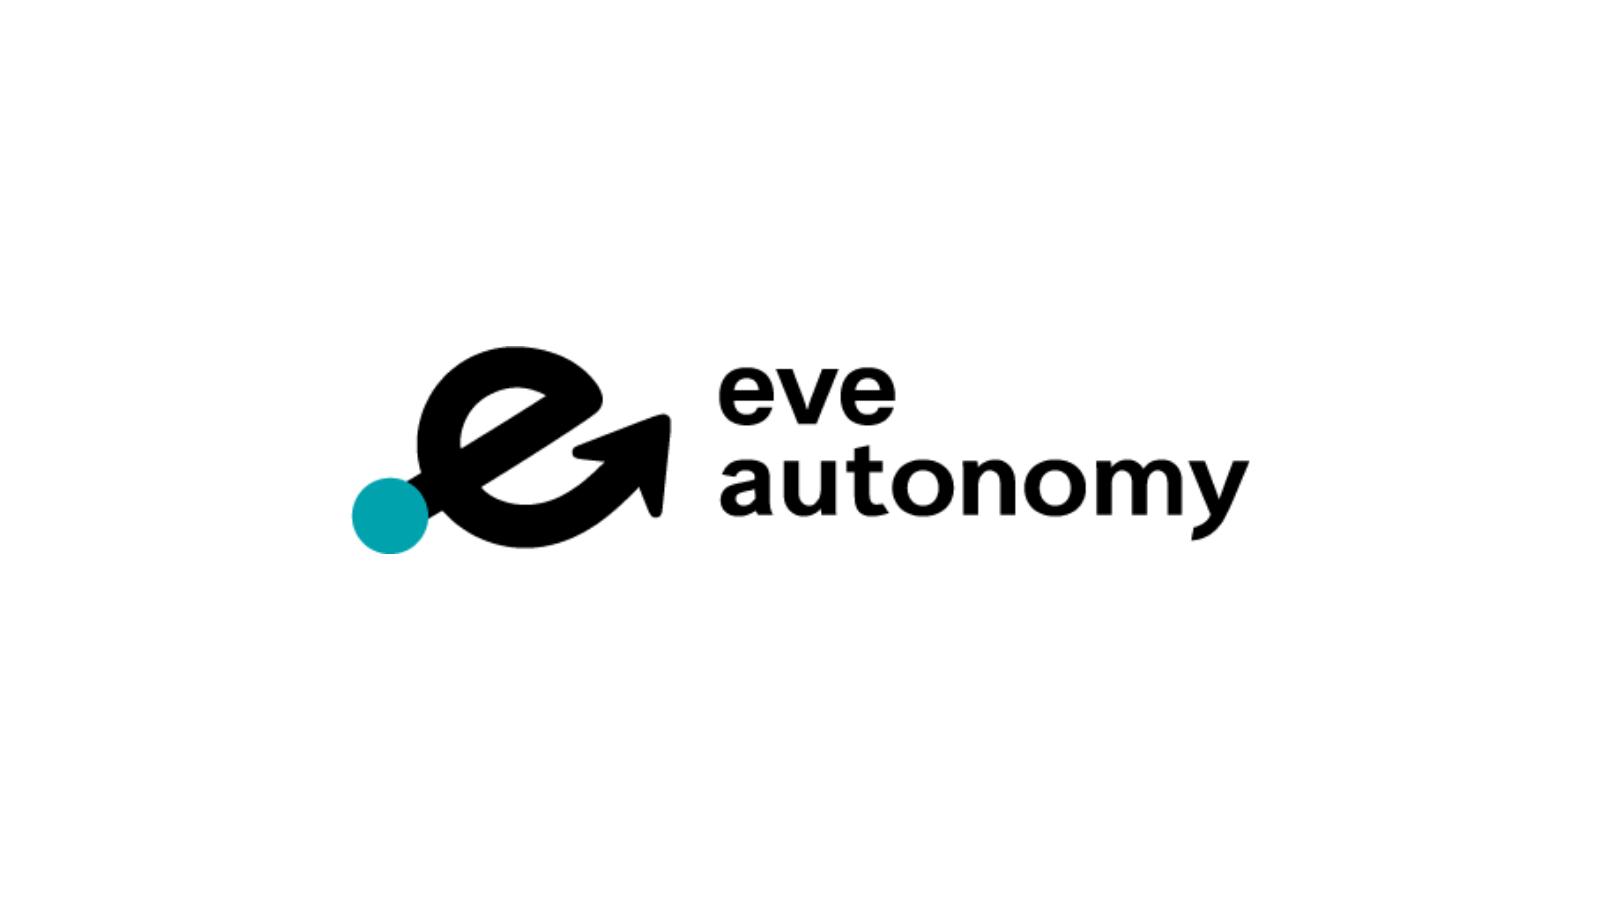 eve autonomy - 自動搬送を 2 カ所目となる ヤマハ発動機磐田南工場で運用開始